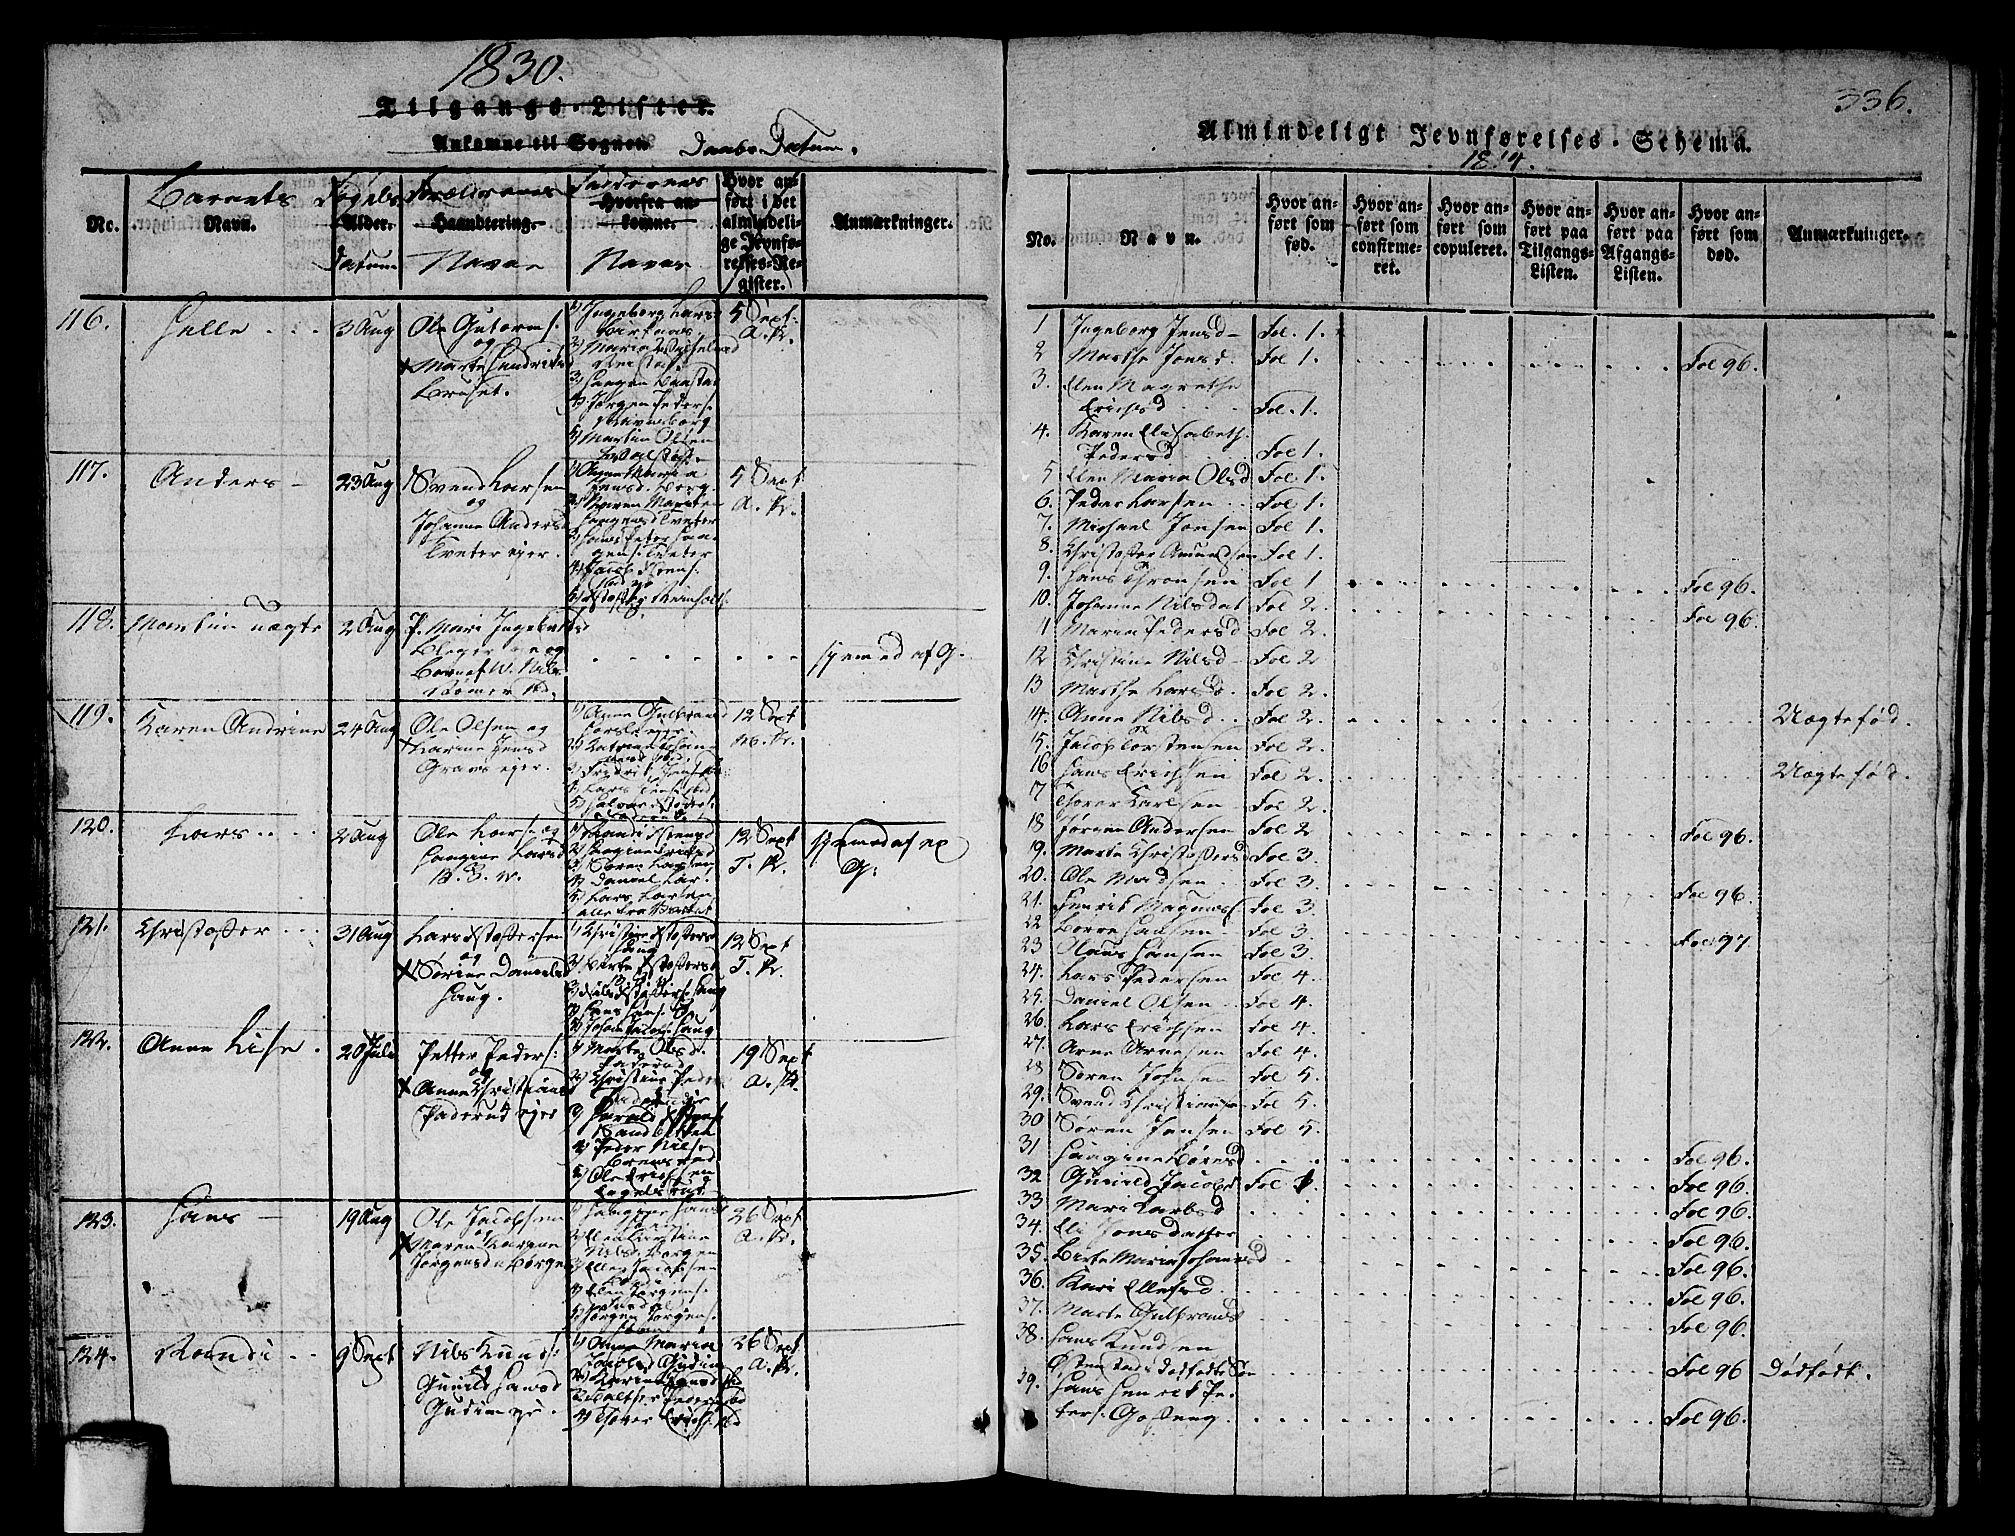 SAO, Asker prestekontor Kirkebøker, G/Ga/L0001: Klokkerbok nr. I 1, 1814-1830, s. 336